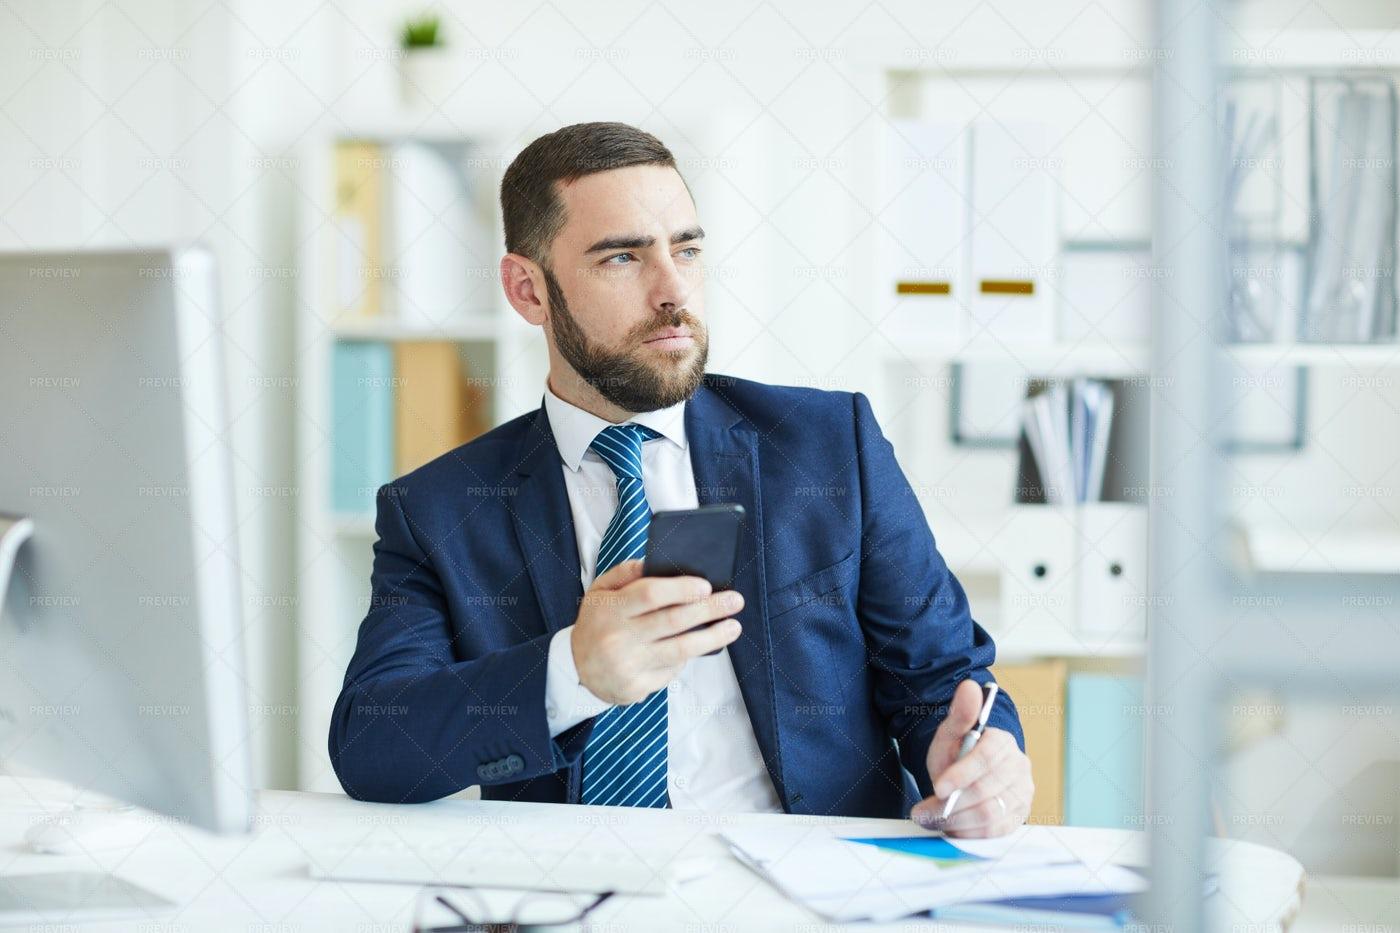 Pensive Businessman Checking Phone: Stock Photos